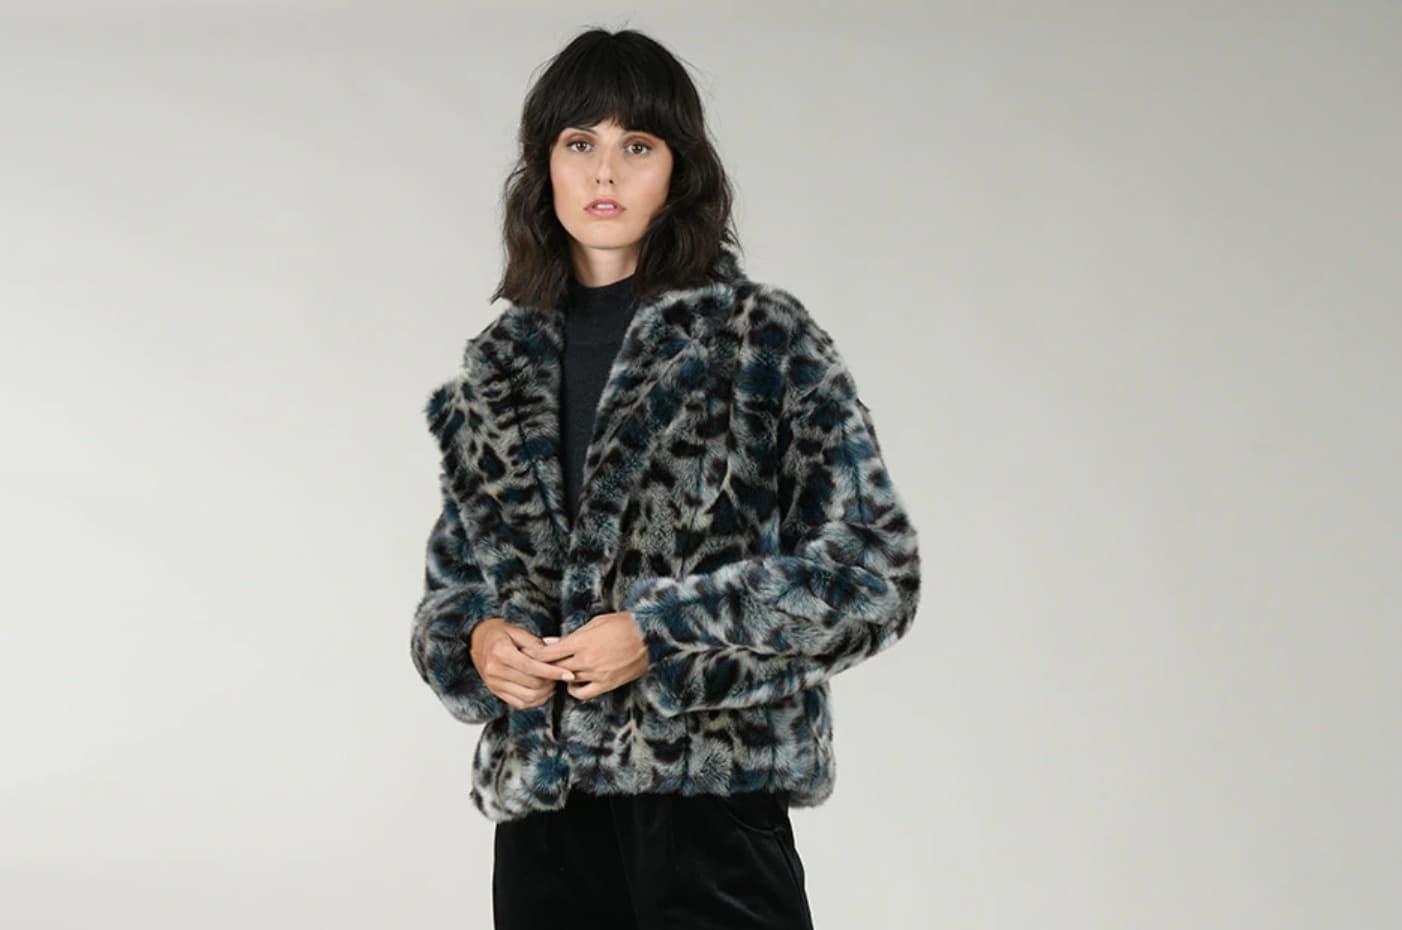 Abrigo de pelo de mujer corto con estampado animal de Molly Bracken